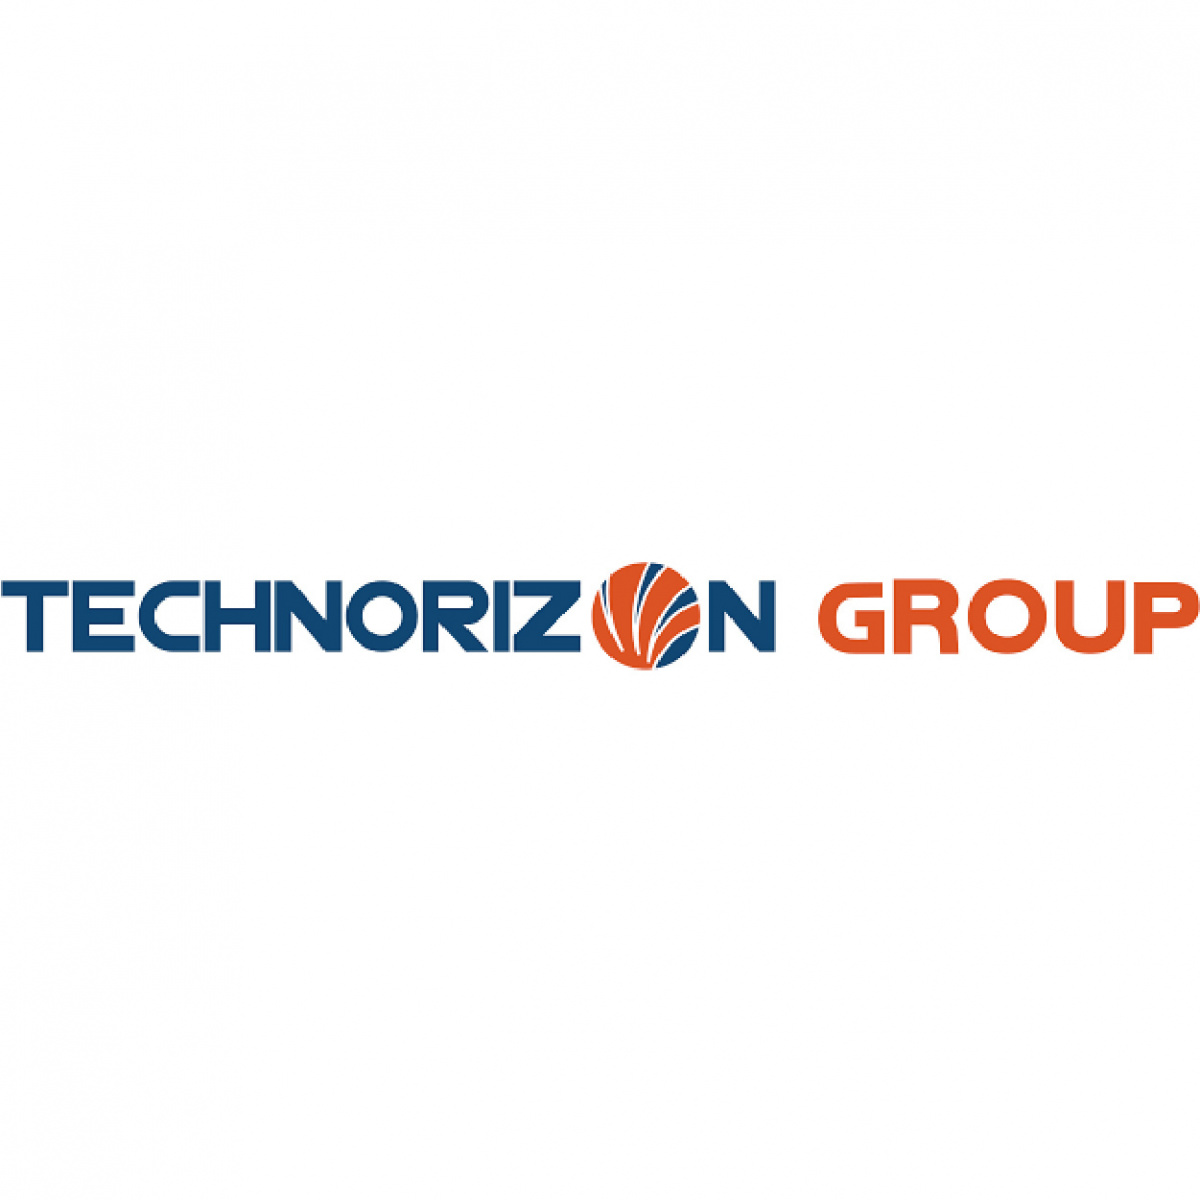 SecureAge Partner Technorizon Group